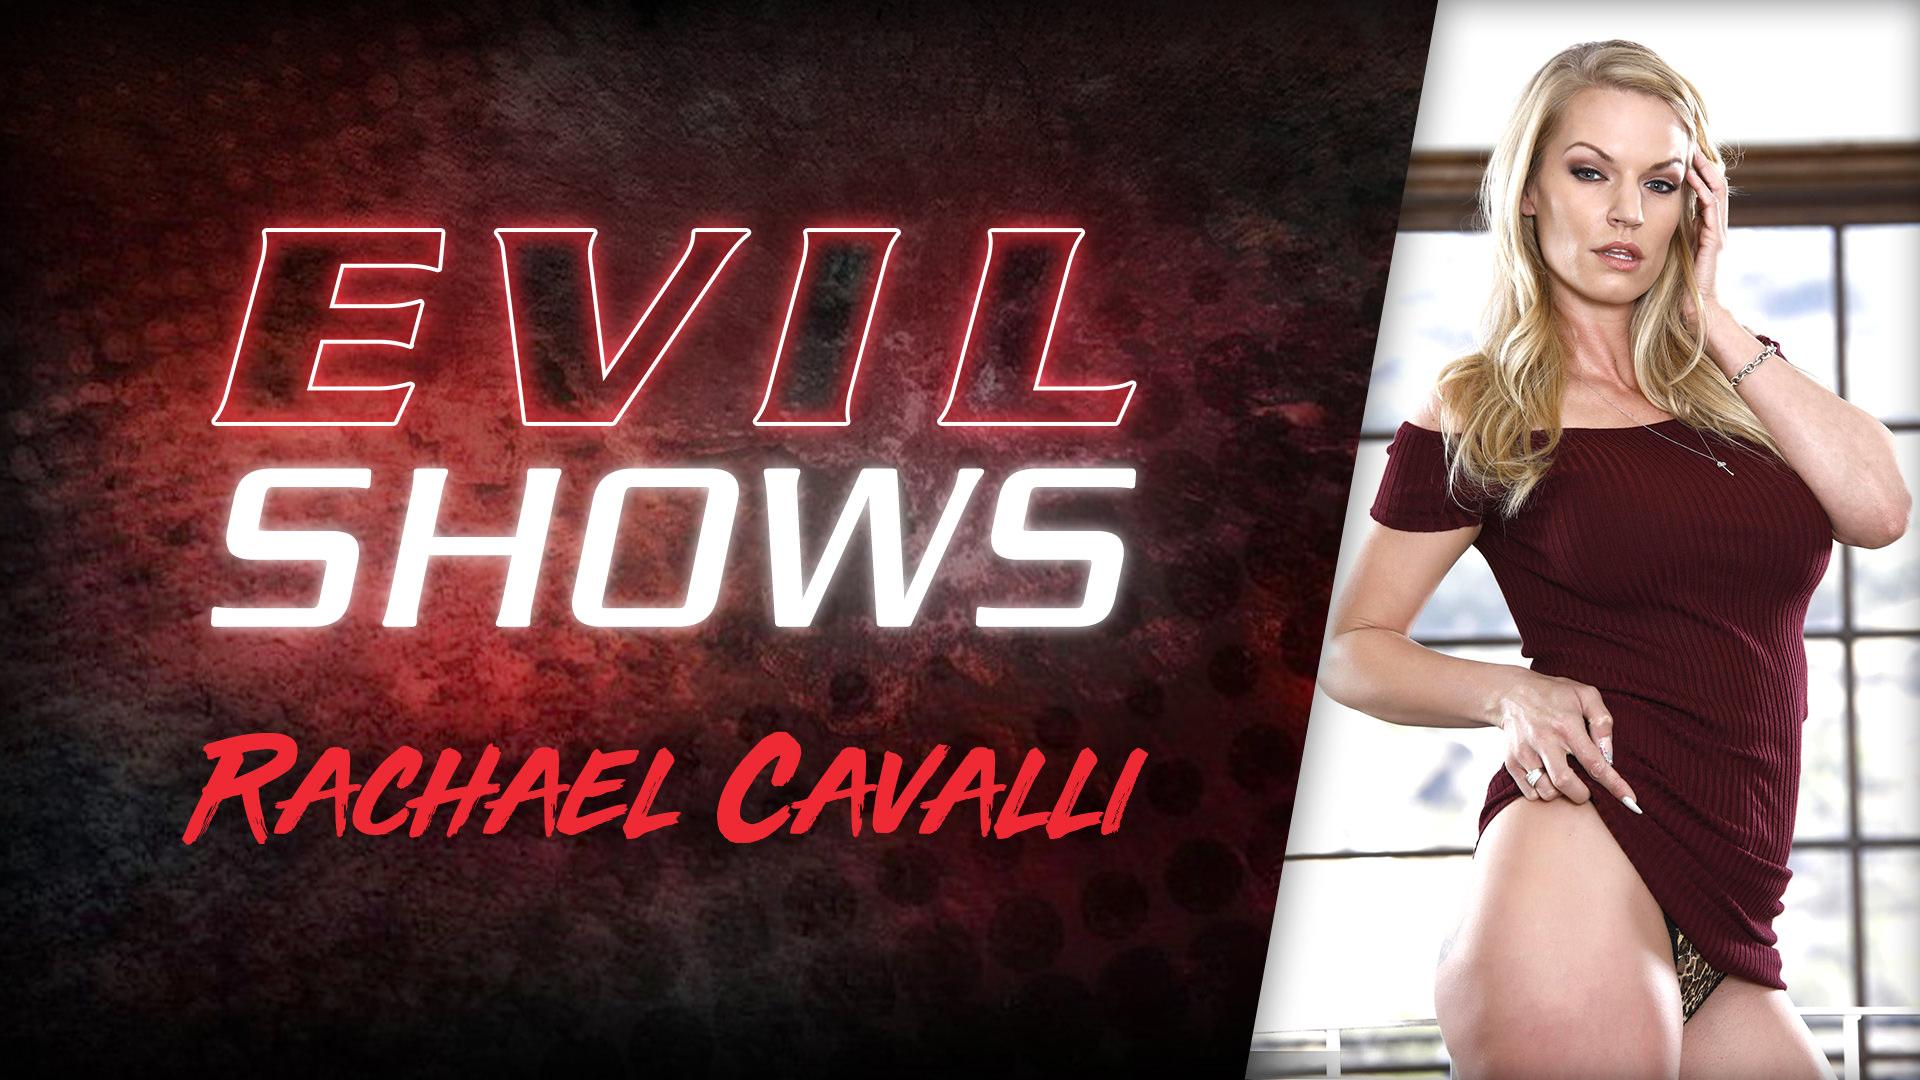 Evil Shows - Rachael Cavalli